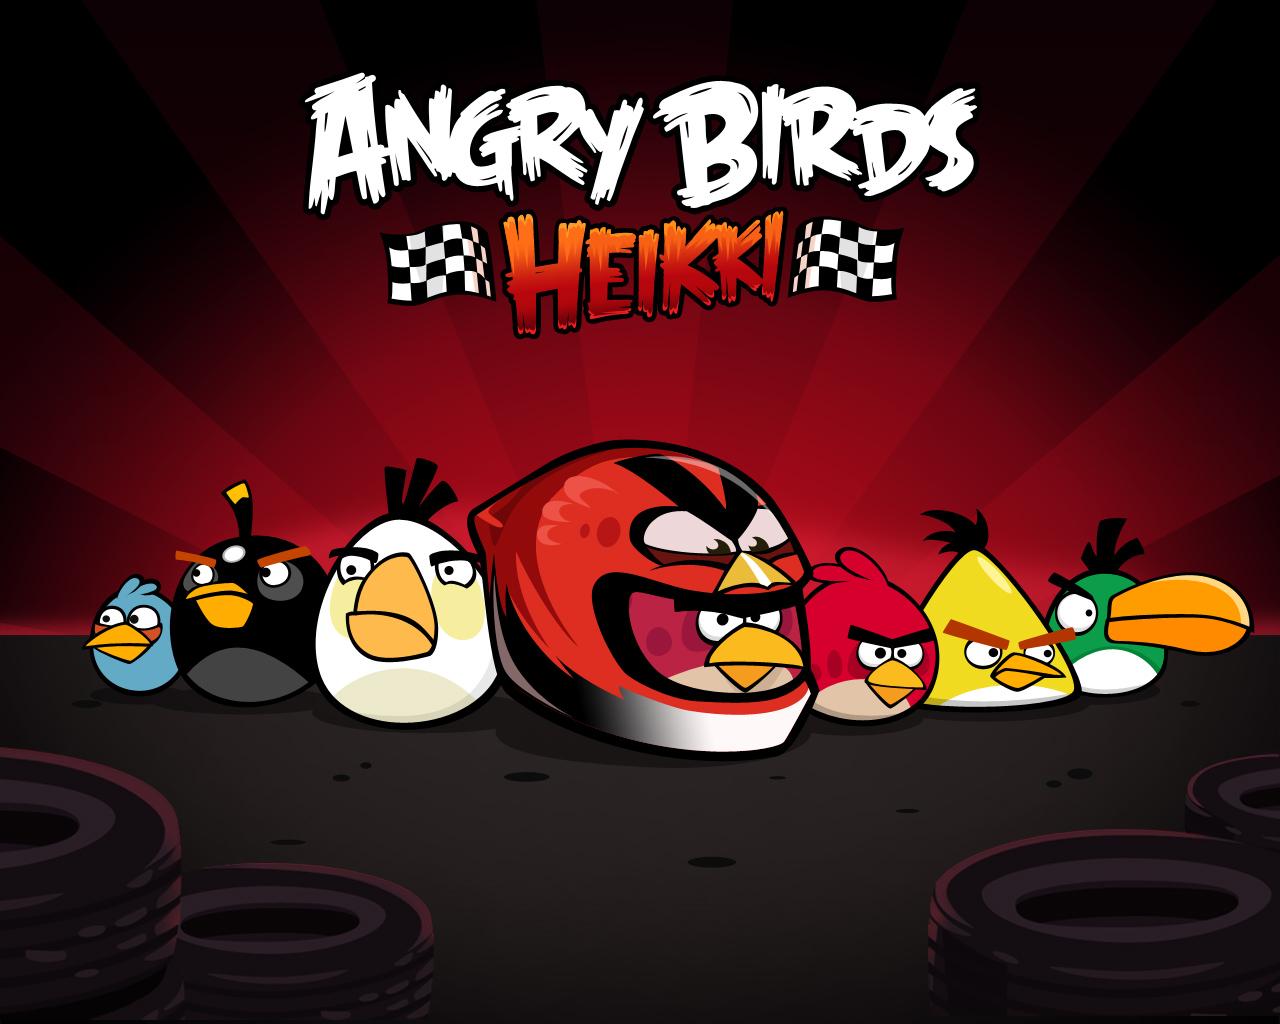 Image - Heikki wallpaper2 1280x1024 - Angry Birds Wiki